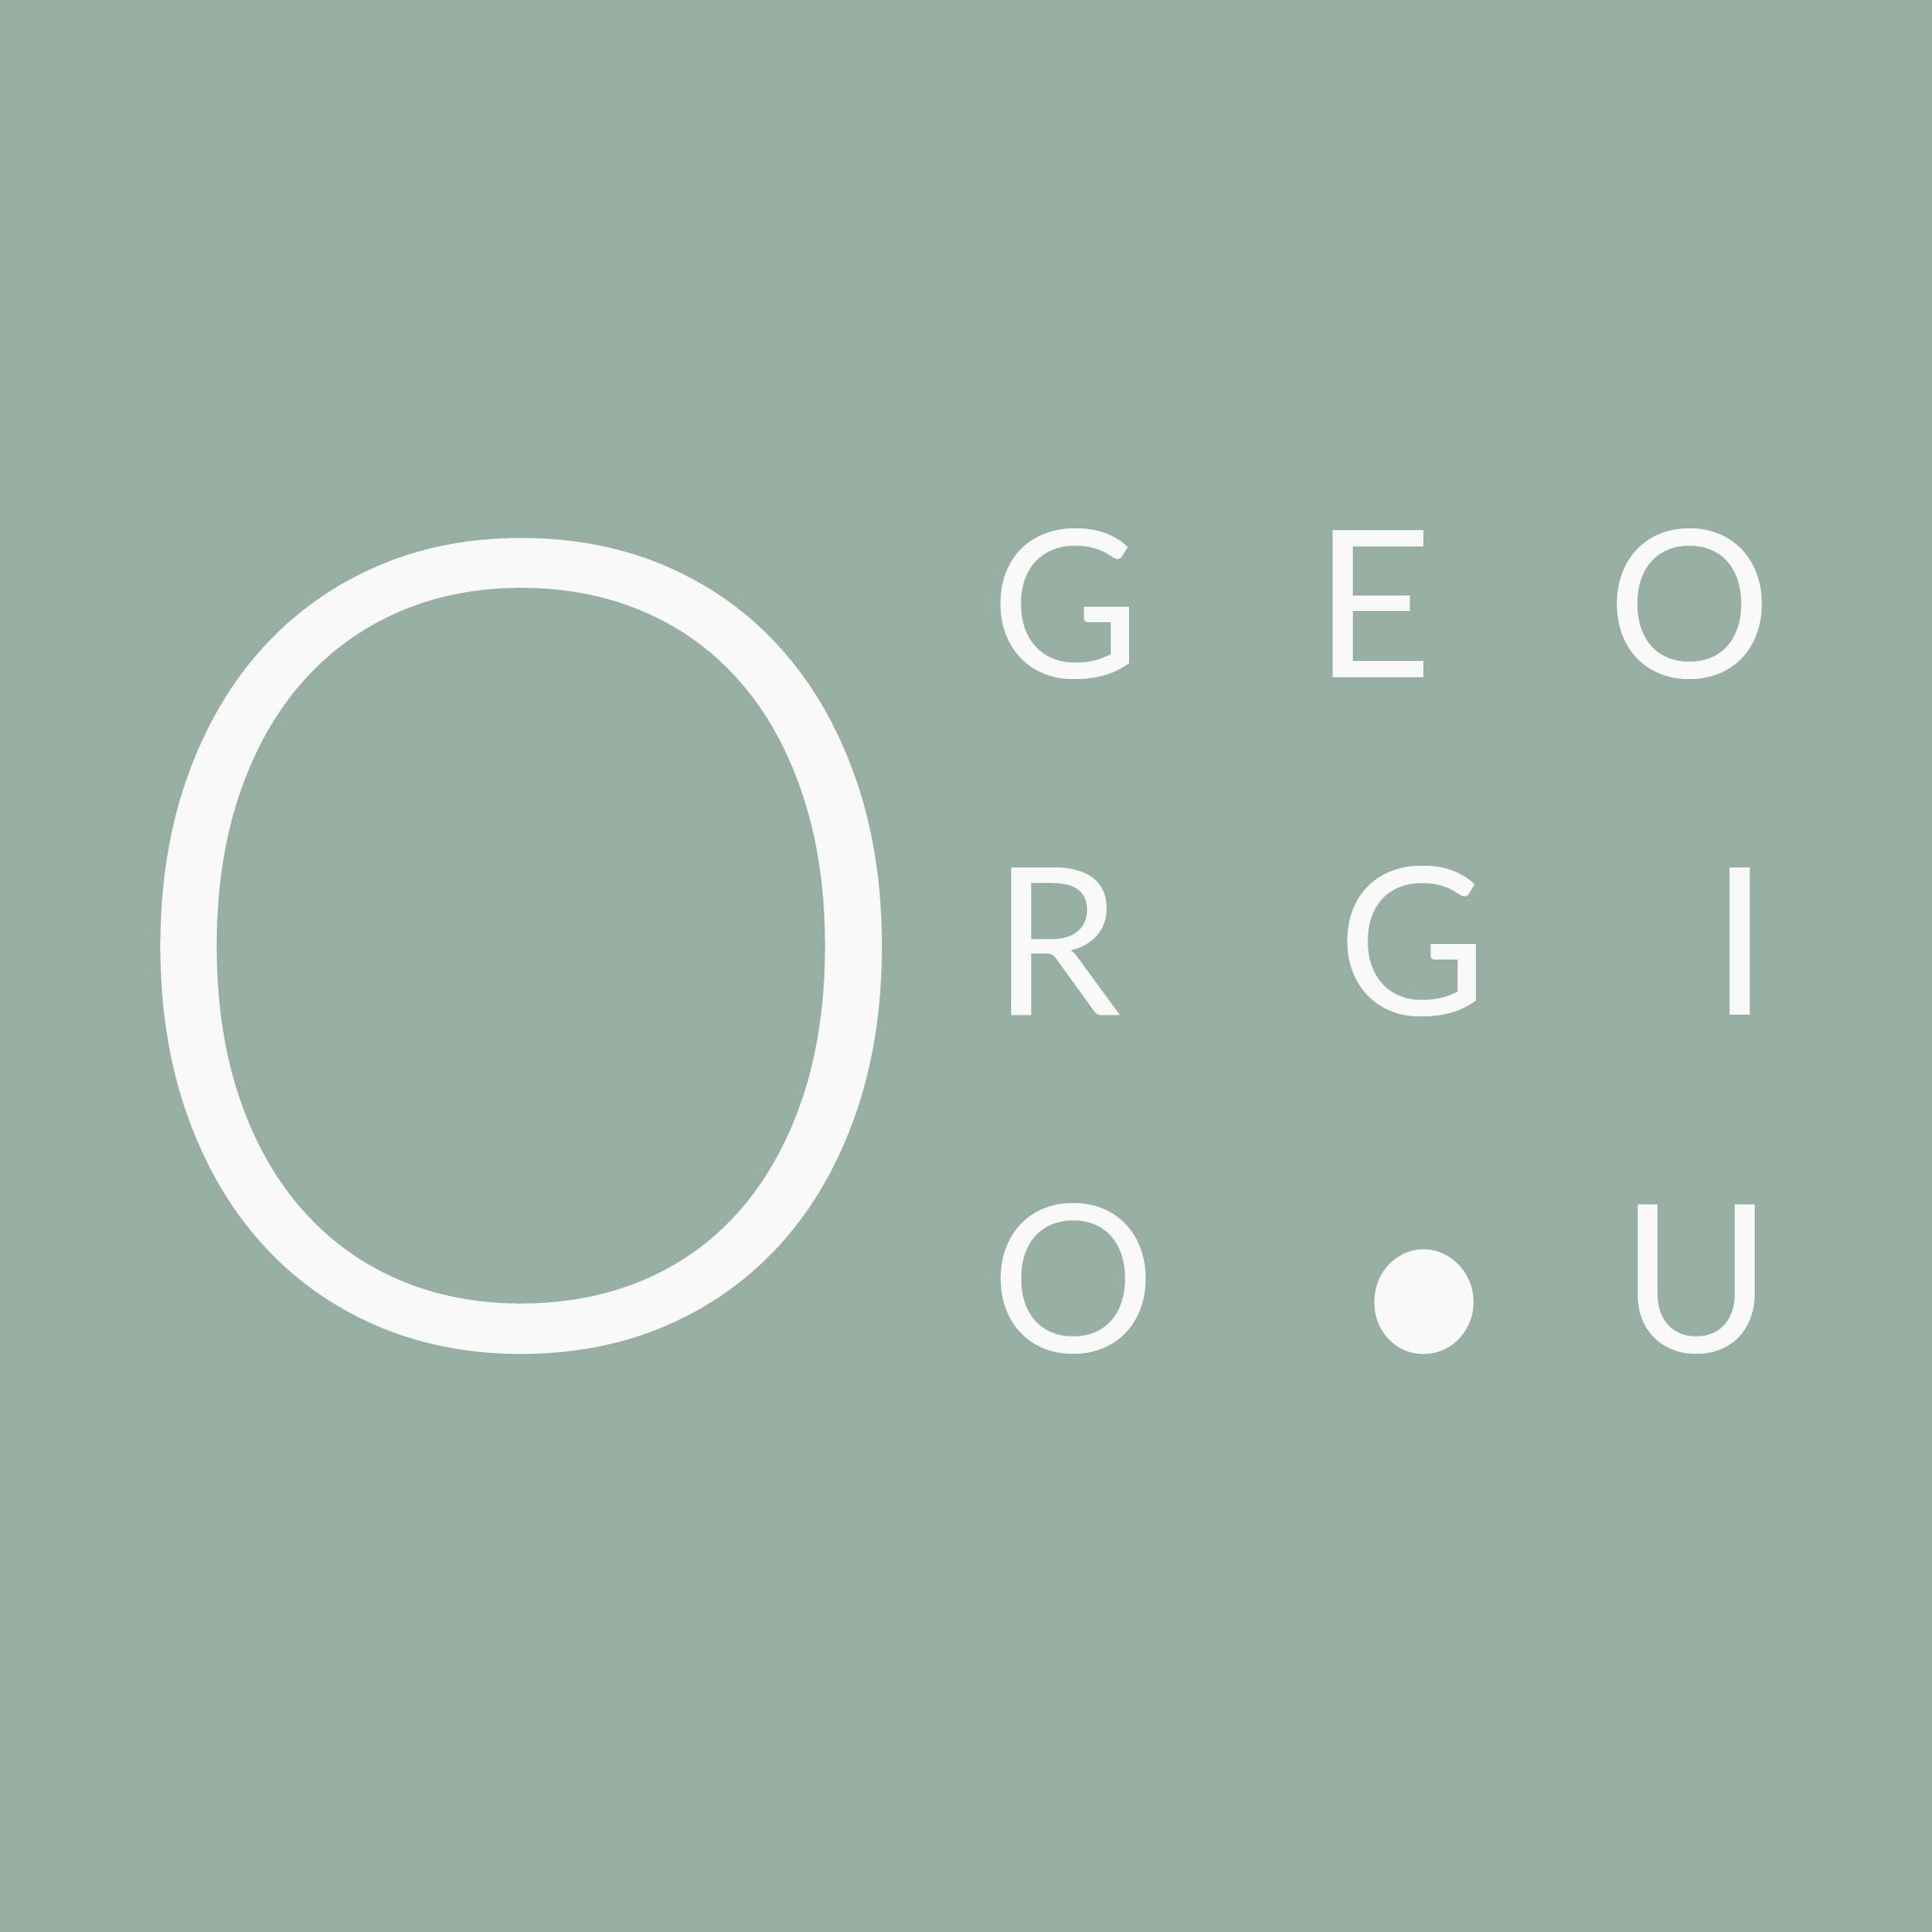 orestis-georgiou-square logo white.jpg